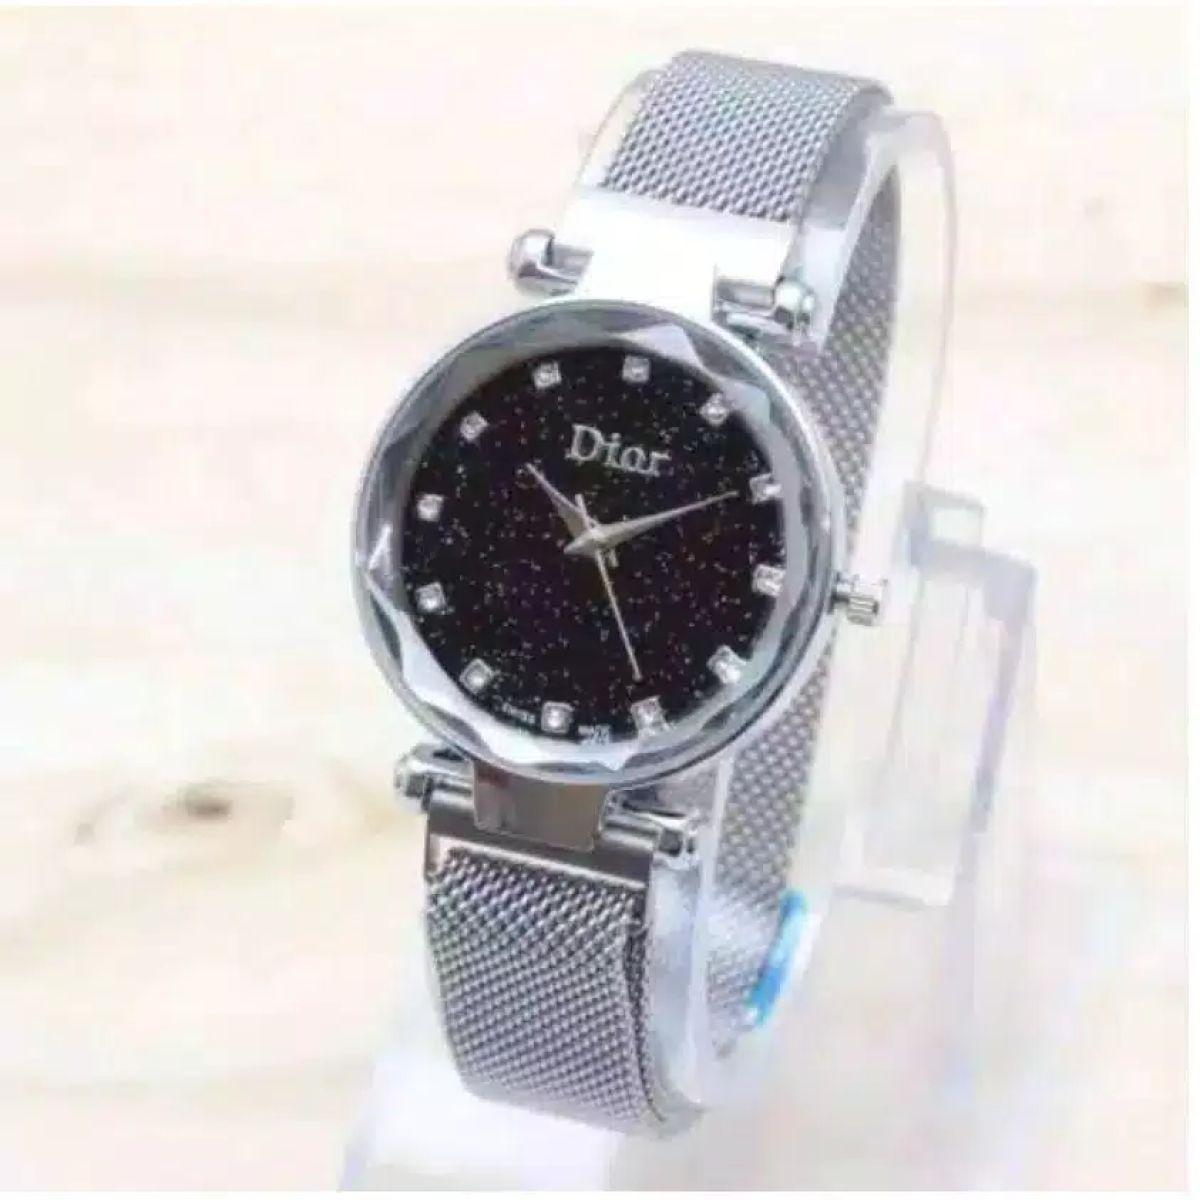 wg-[✅cod] jam tangan wanita d1or magnet permata diamond casual styles fashion wanita